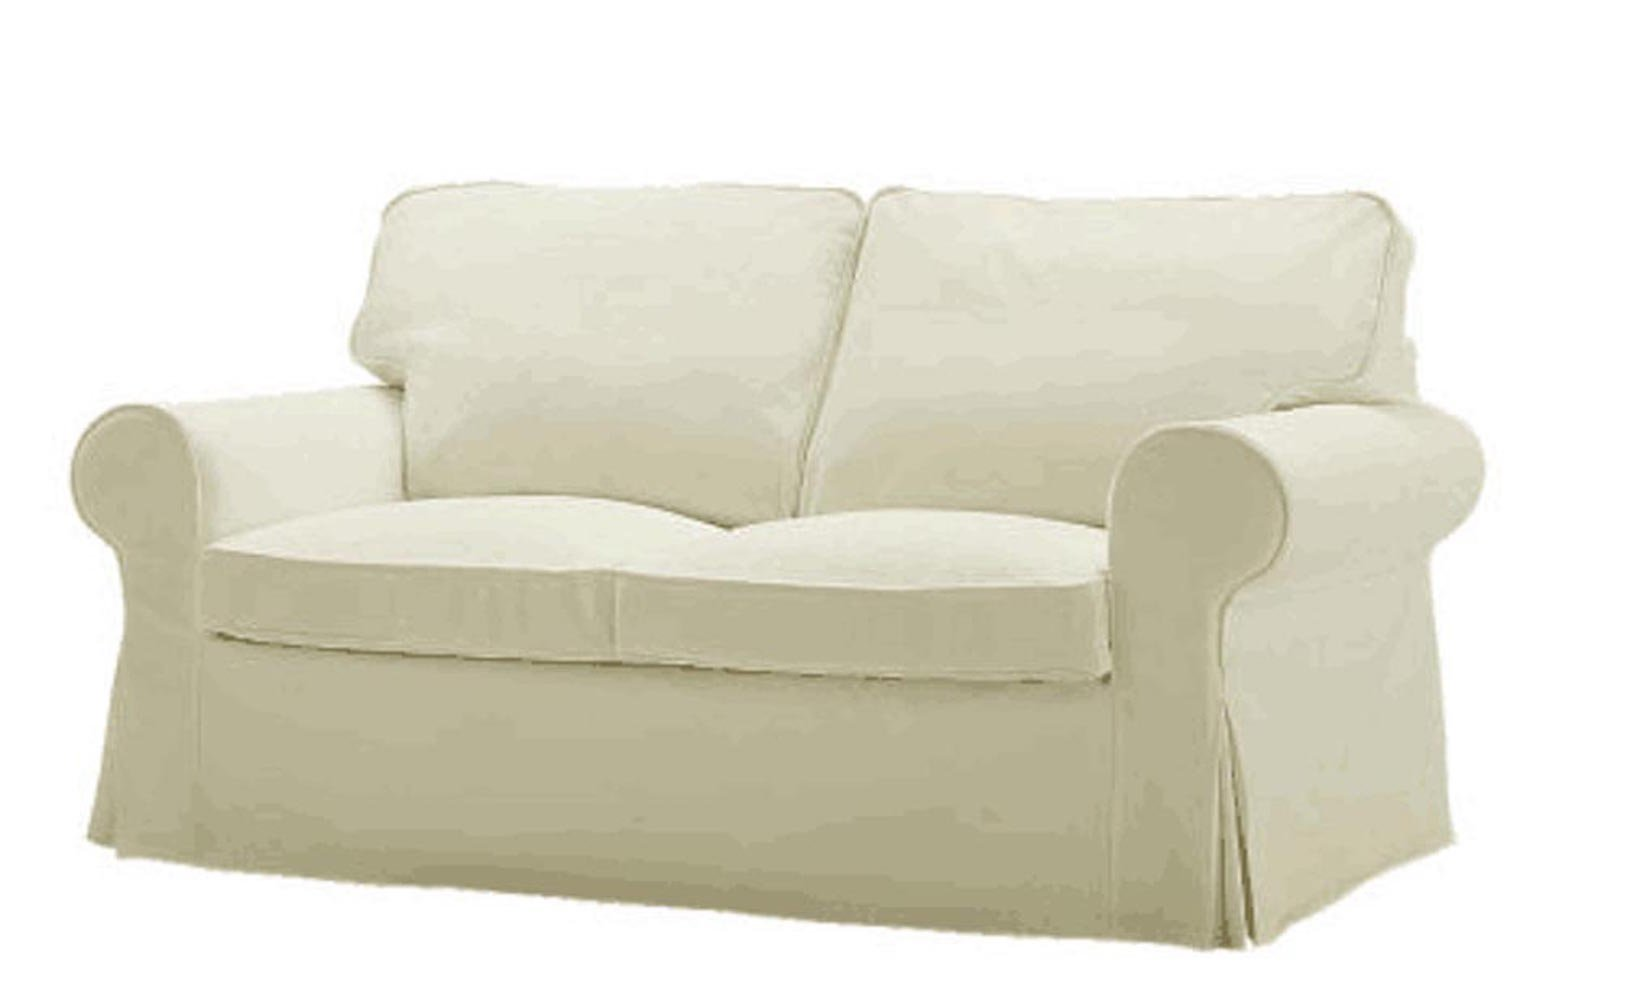 Cheap Single Sofa Bed Ikea Find Single Sofa Bed Ikea Deals On Line